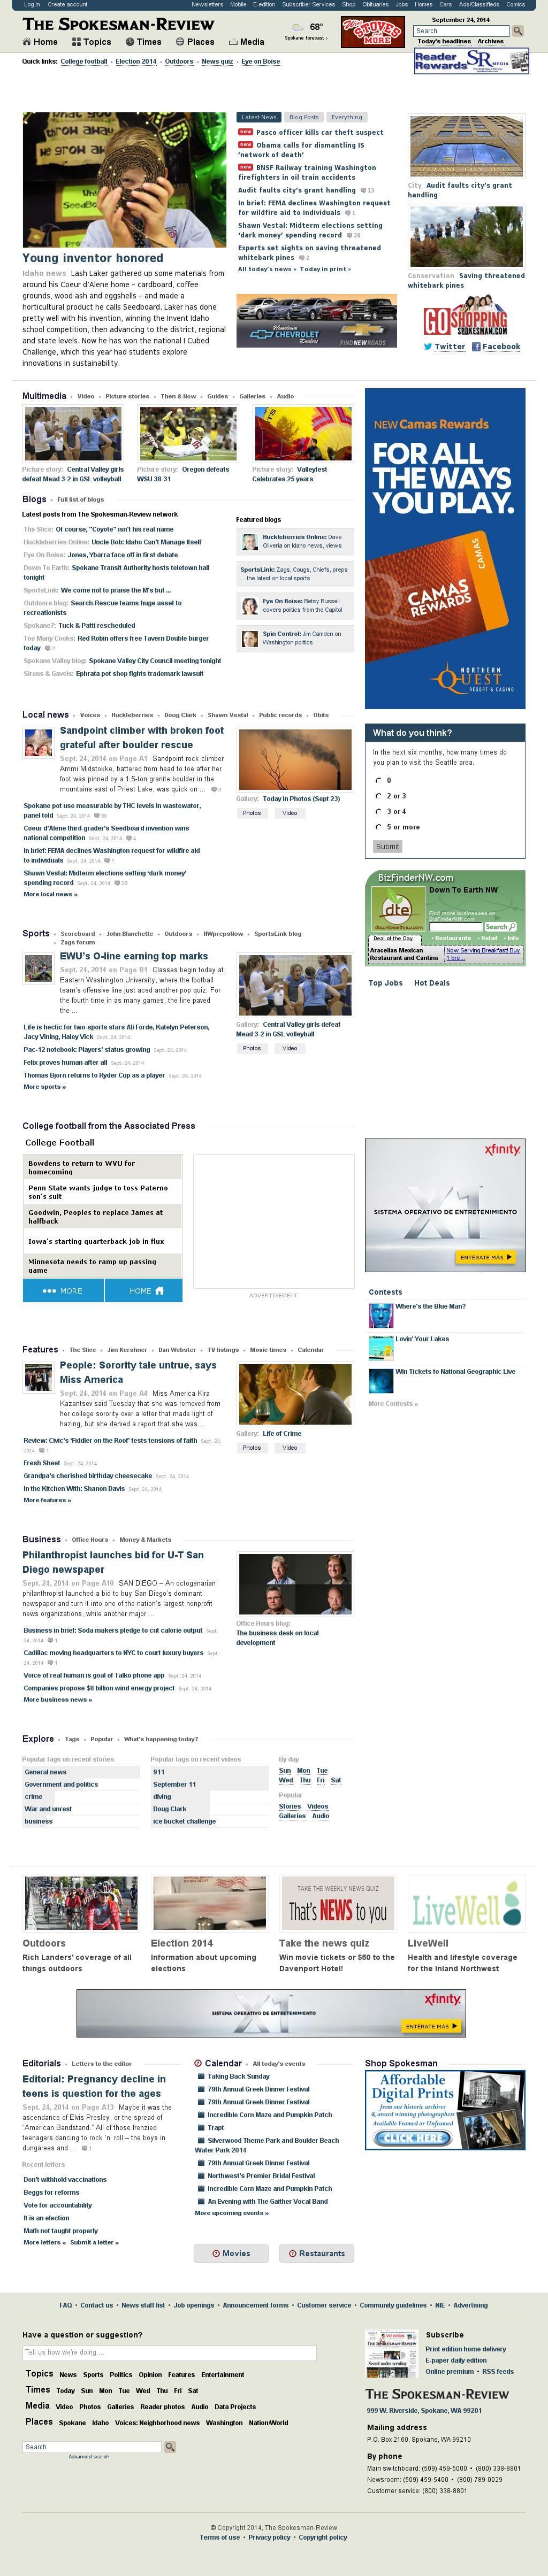 The (Spokane) Spokesman-Review at Wednesday Sept. 24, 2014, 4:18 p.m. UTC